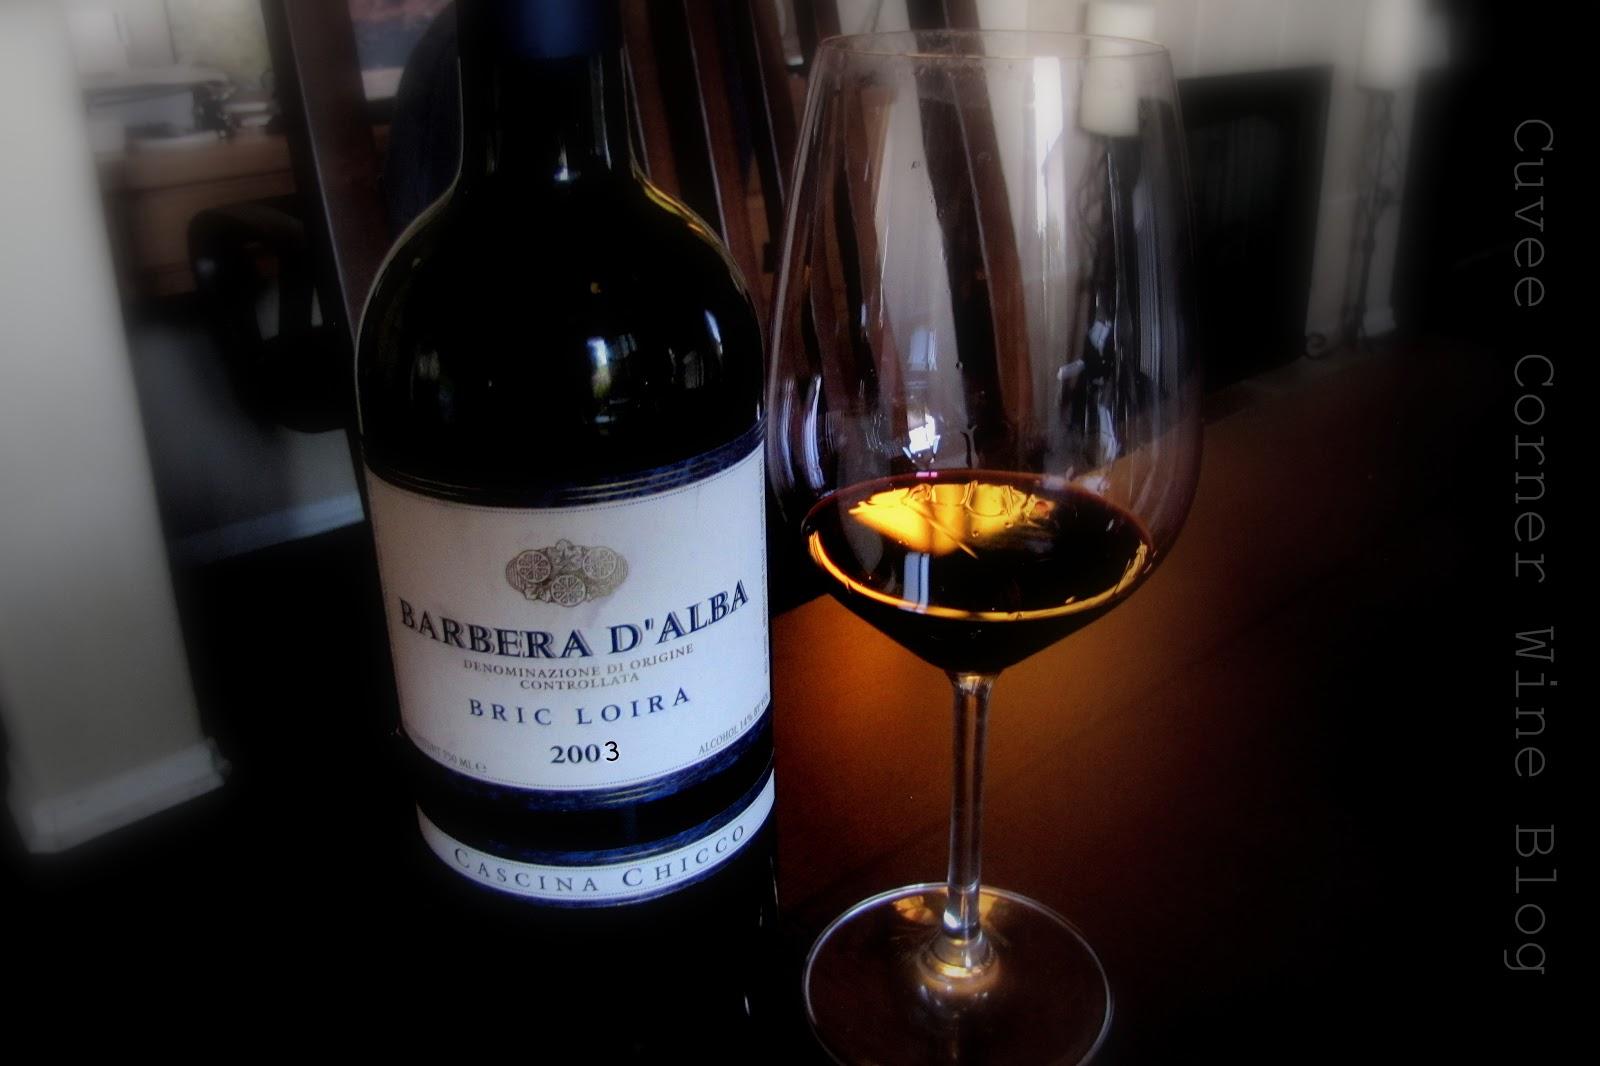 La Jolla Wine Tours San Diego